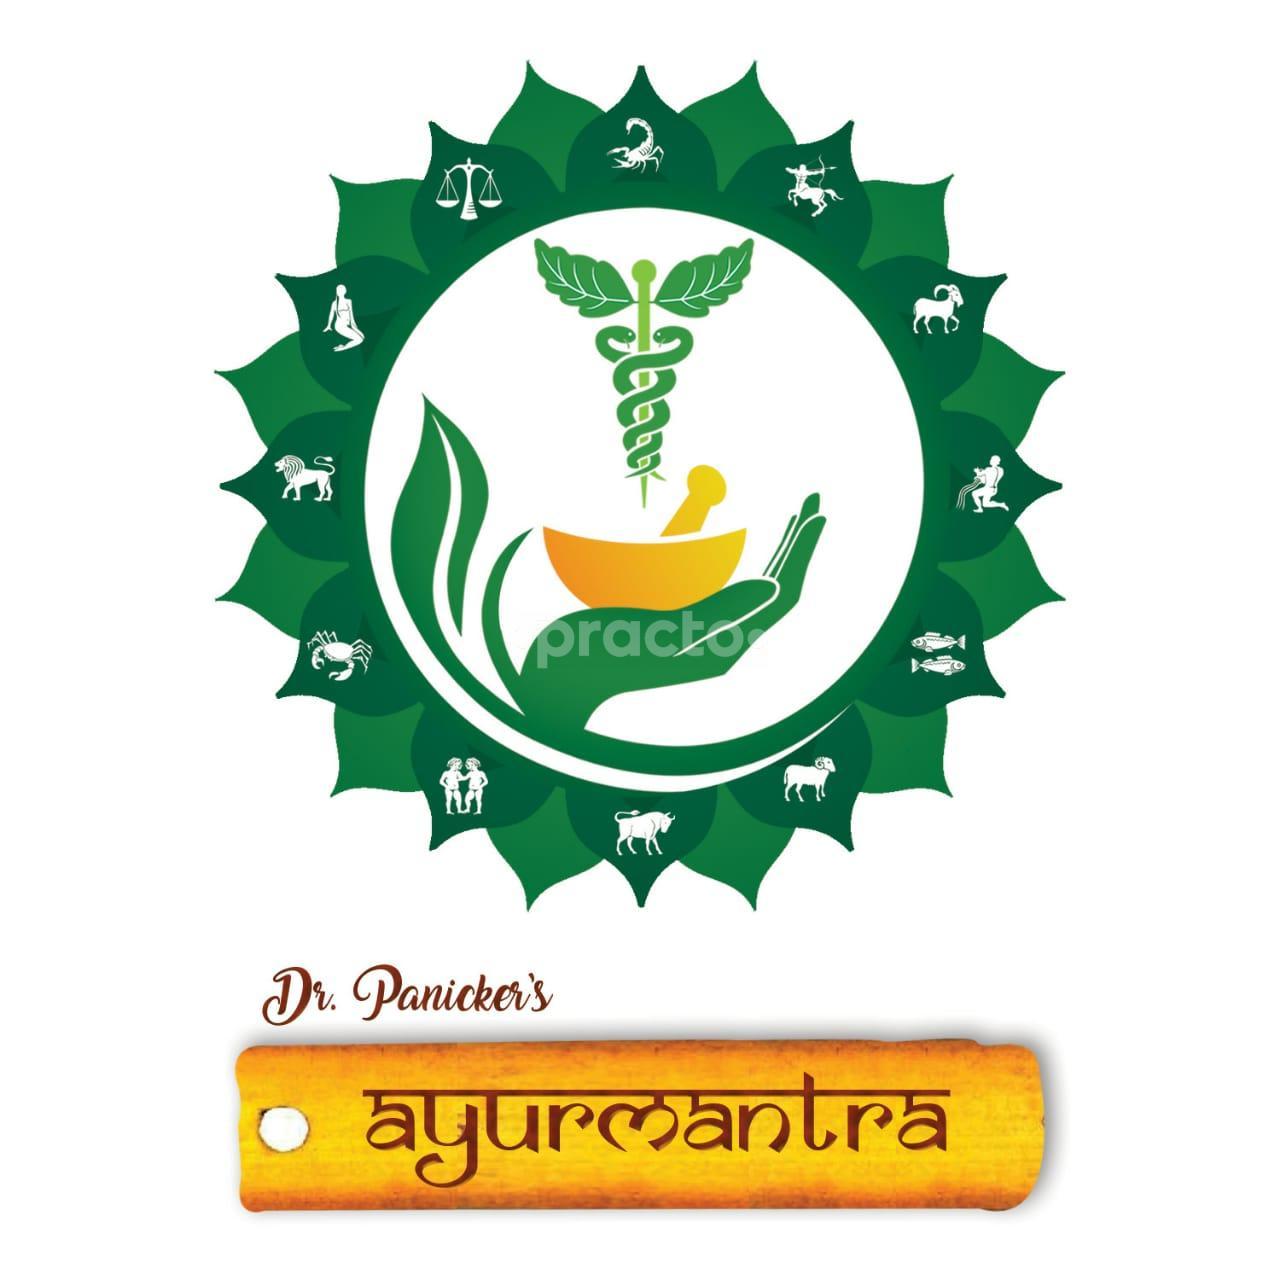 Dr. Panicker's Ayurmantra